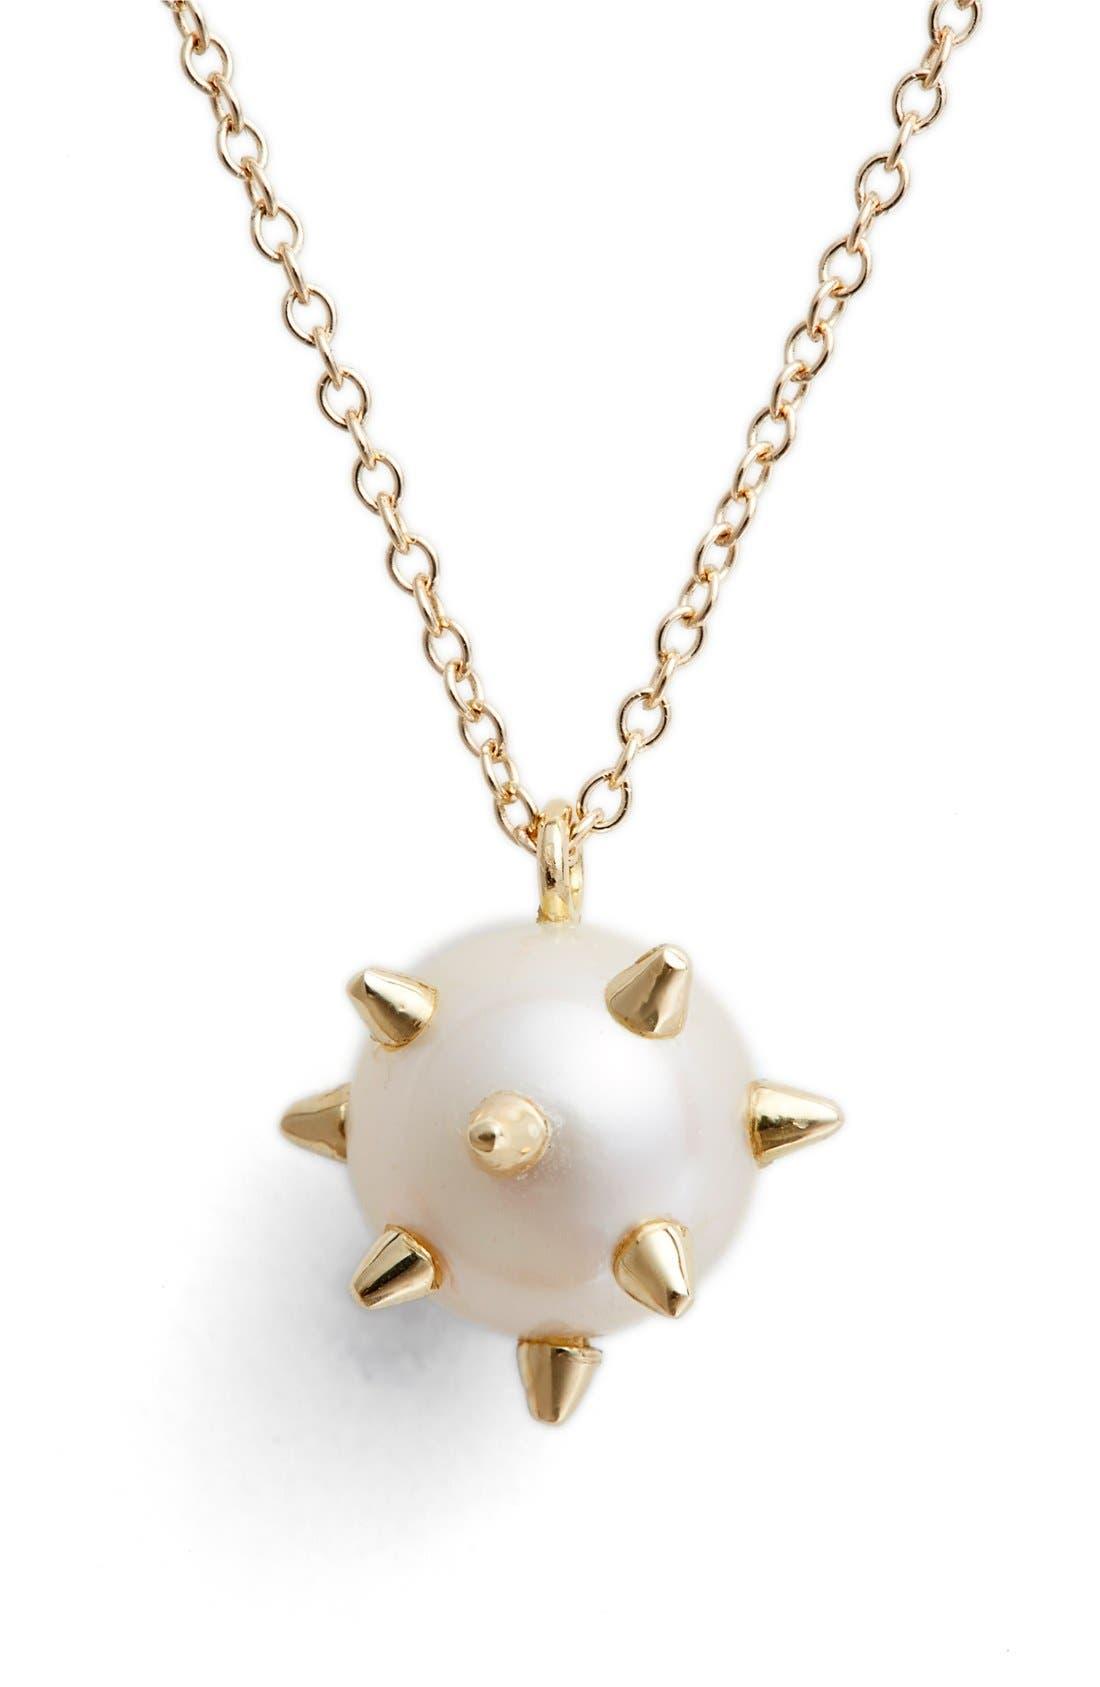 Main Image - Nektar de Stagni 'New Classics' Spike Cultured Pearl Pendant Necklace